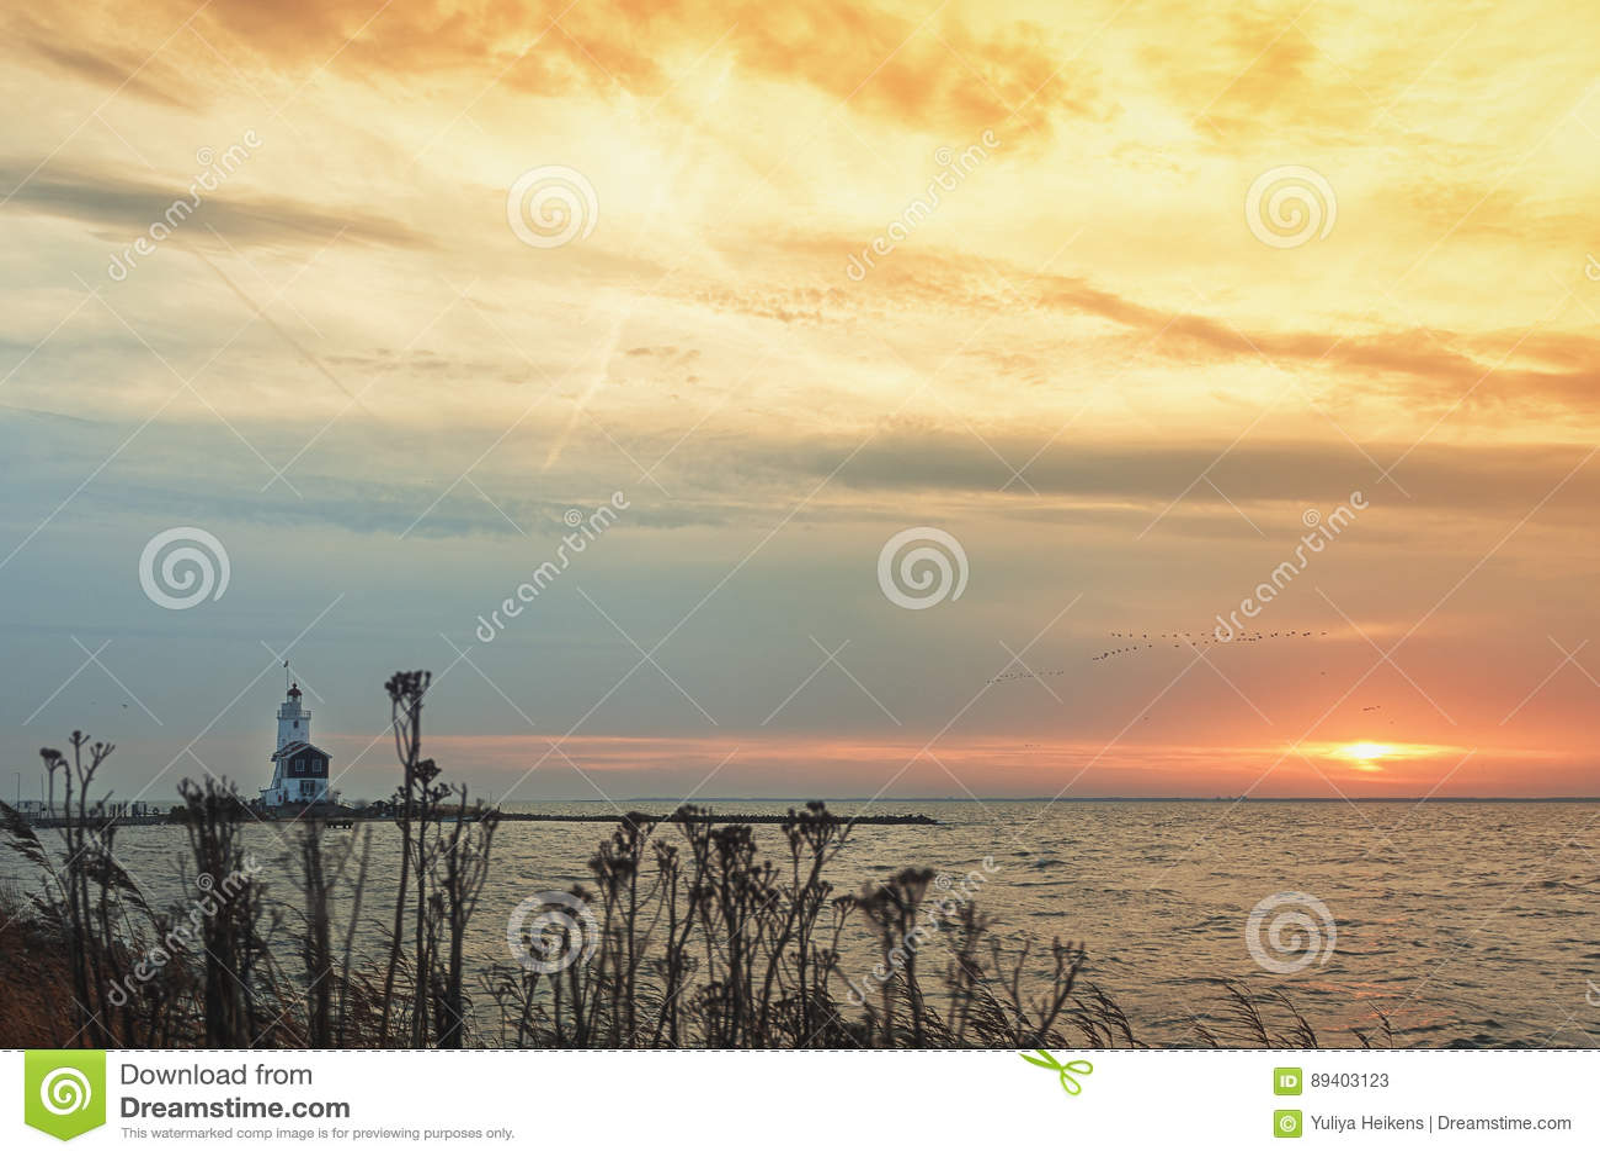 O cavalo do farol de Marken durante o nascer do sol